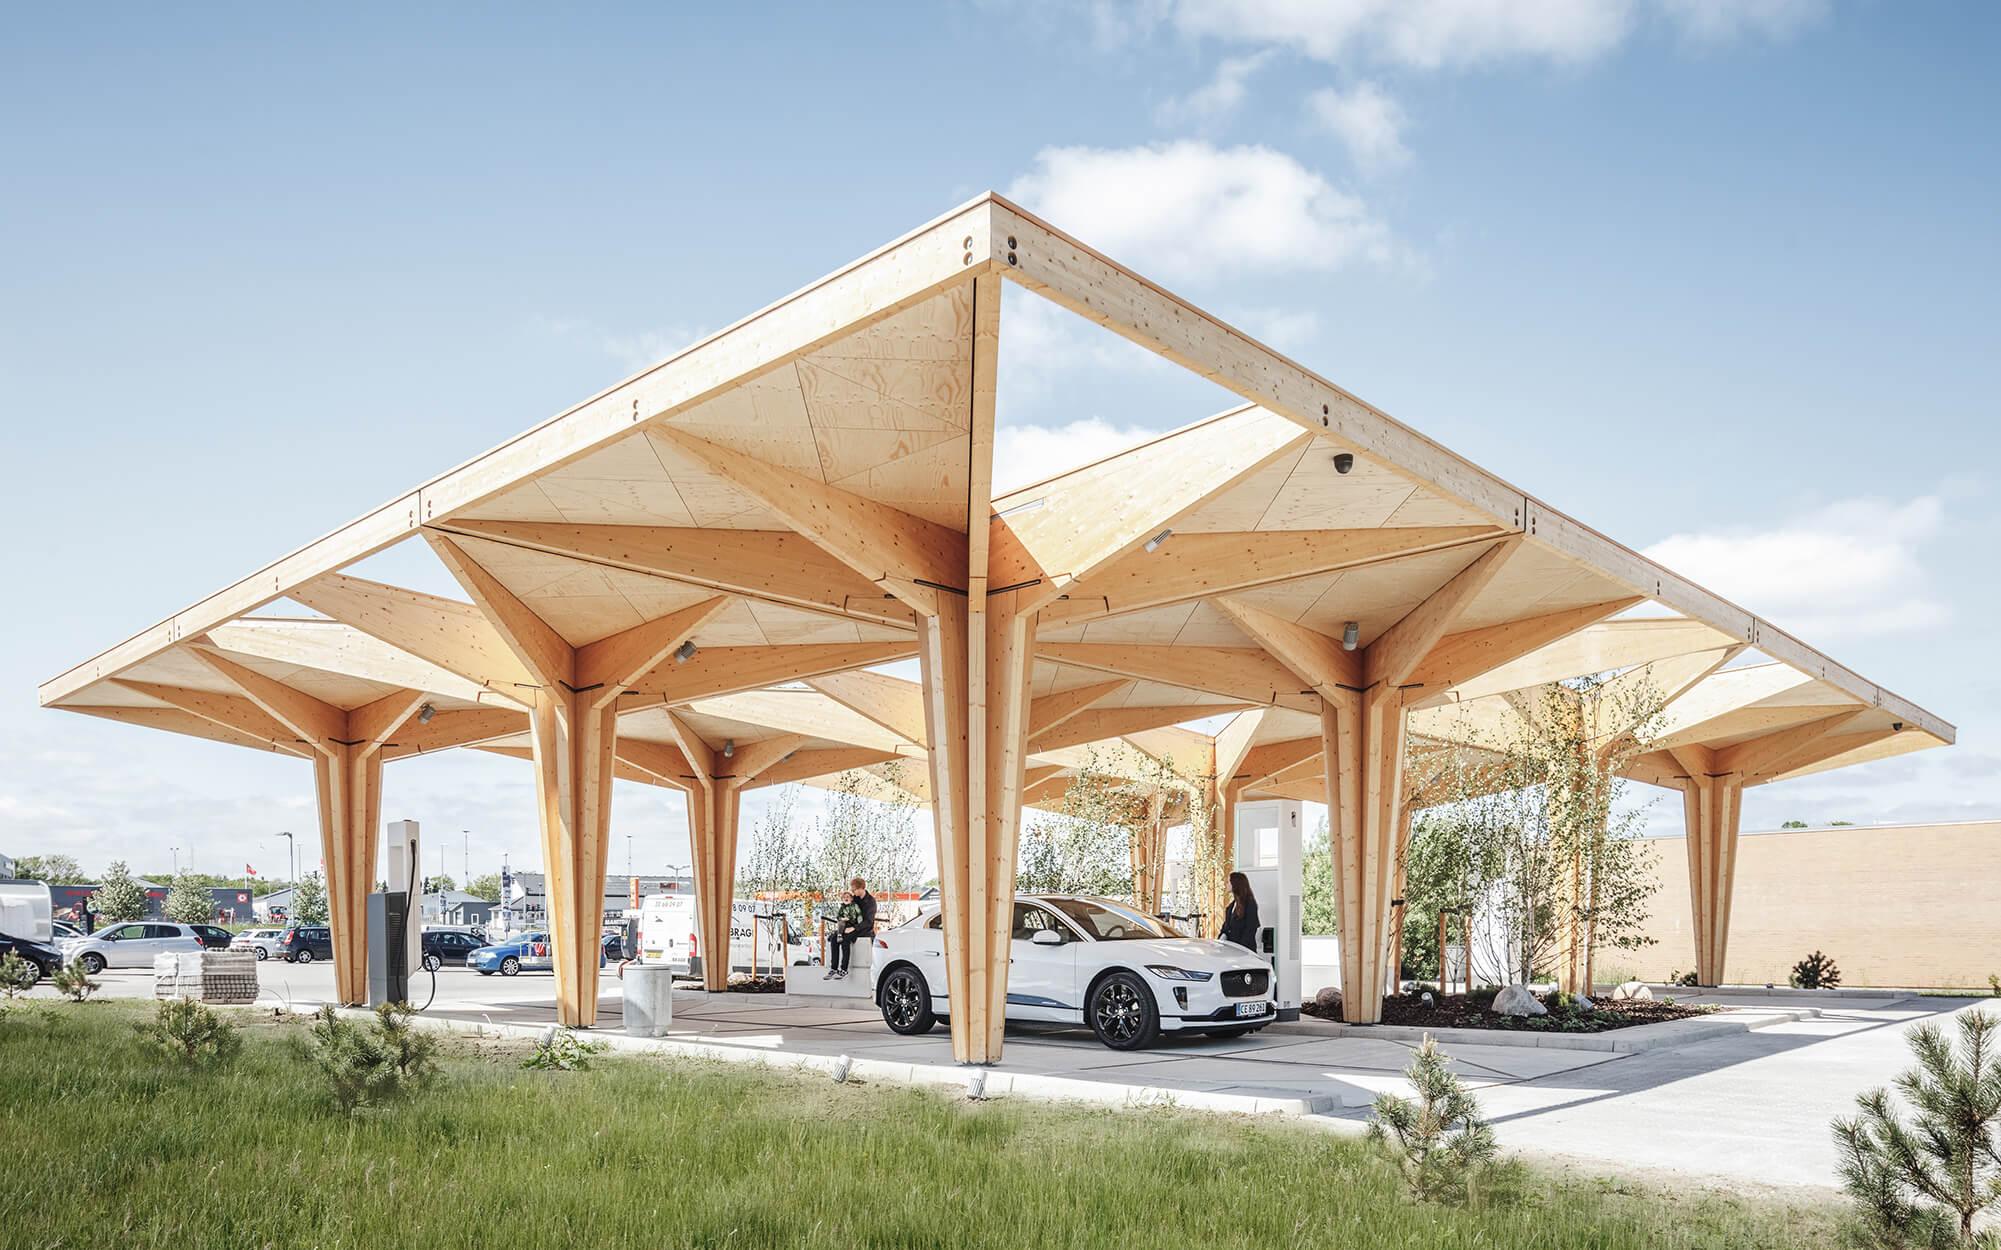 COBE, EV Charging Station, Fredericia